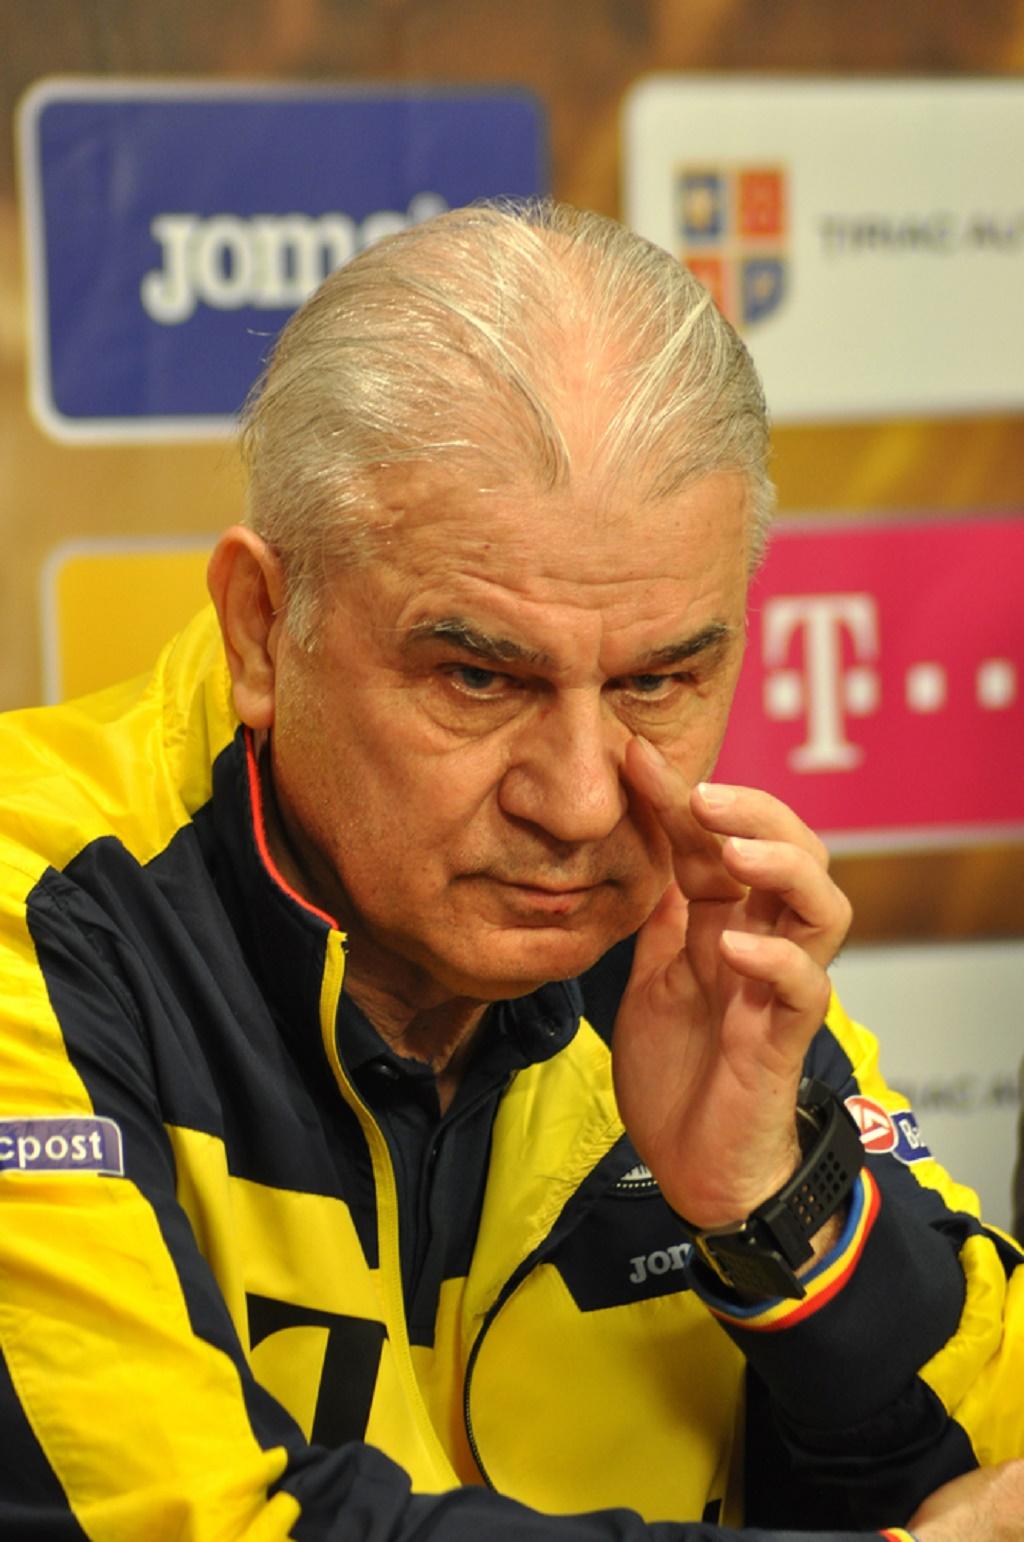 Euro 2016 durere imensa pentru Anghel Iordanescu, dupa esecul cu Franta